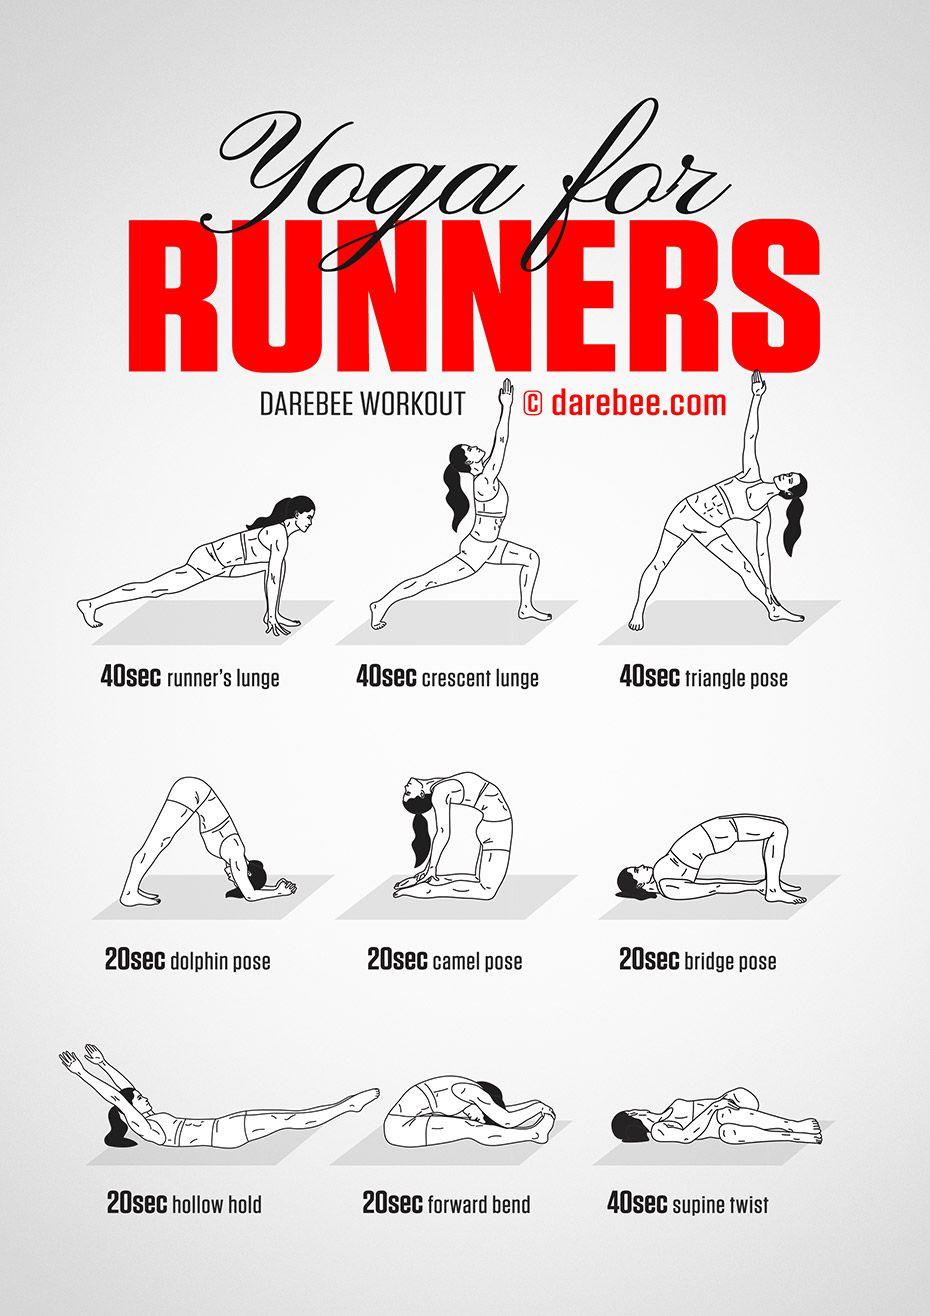 Citaten Yoga : Yoga for runners fitness pinterest lichaamsbeweging